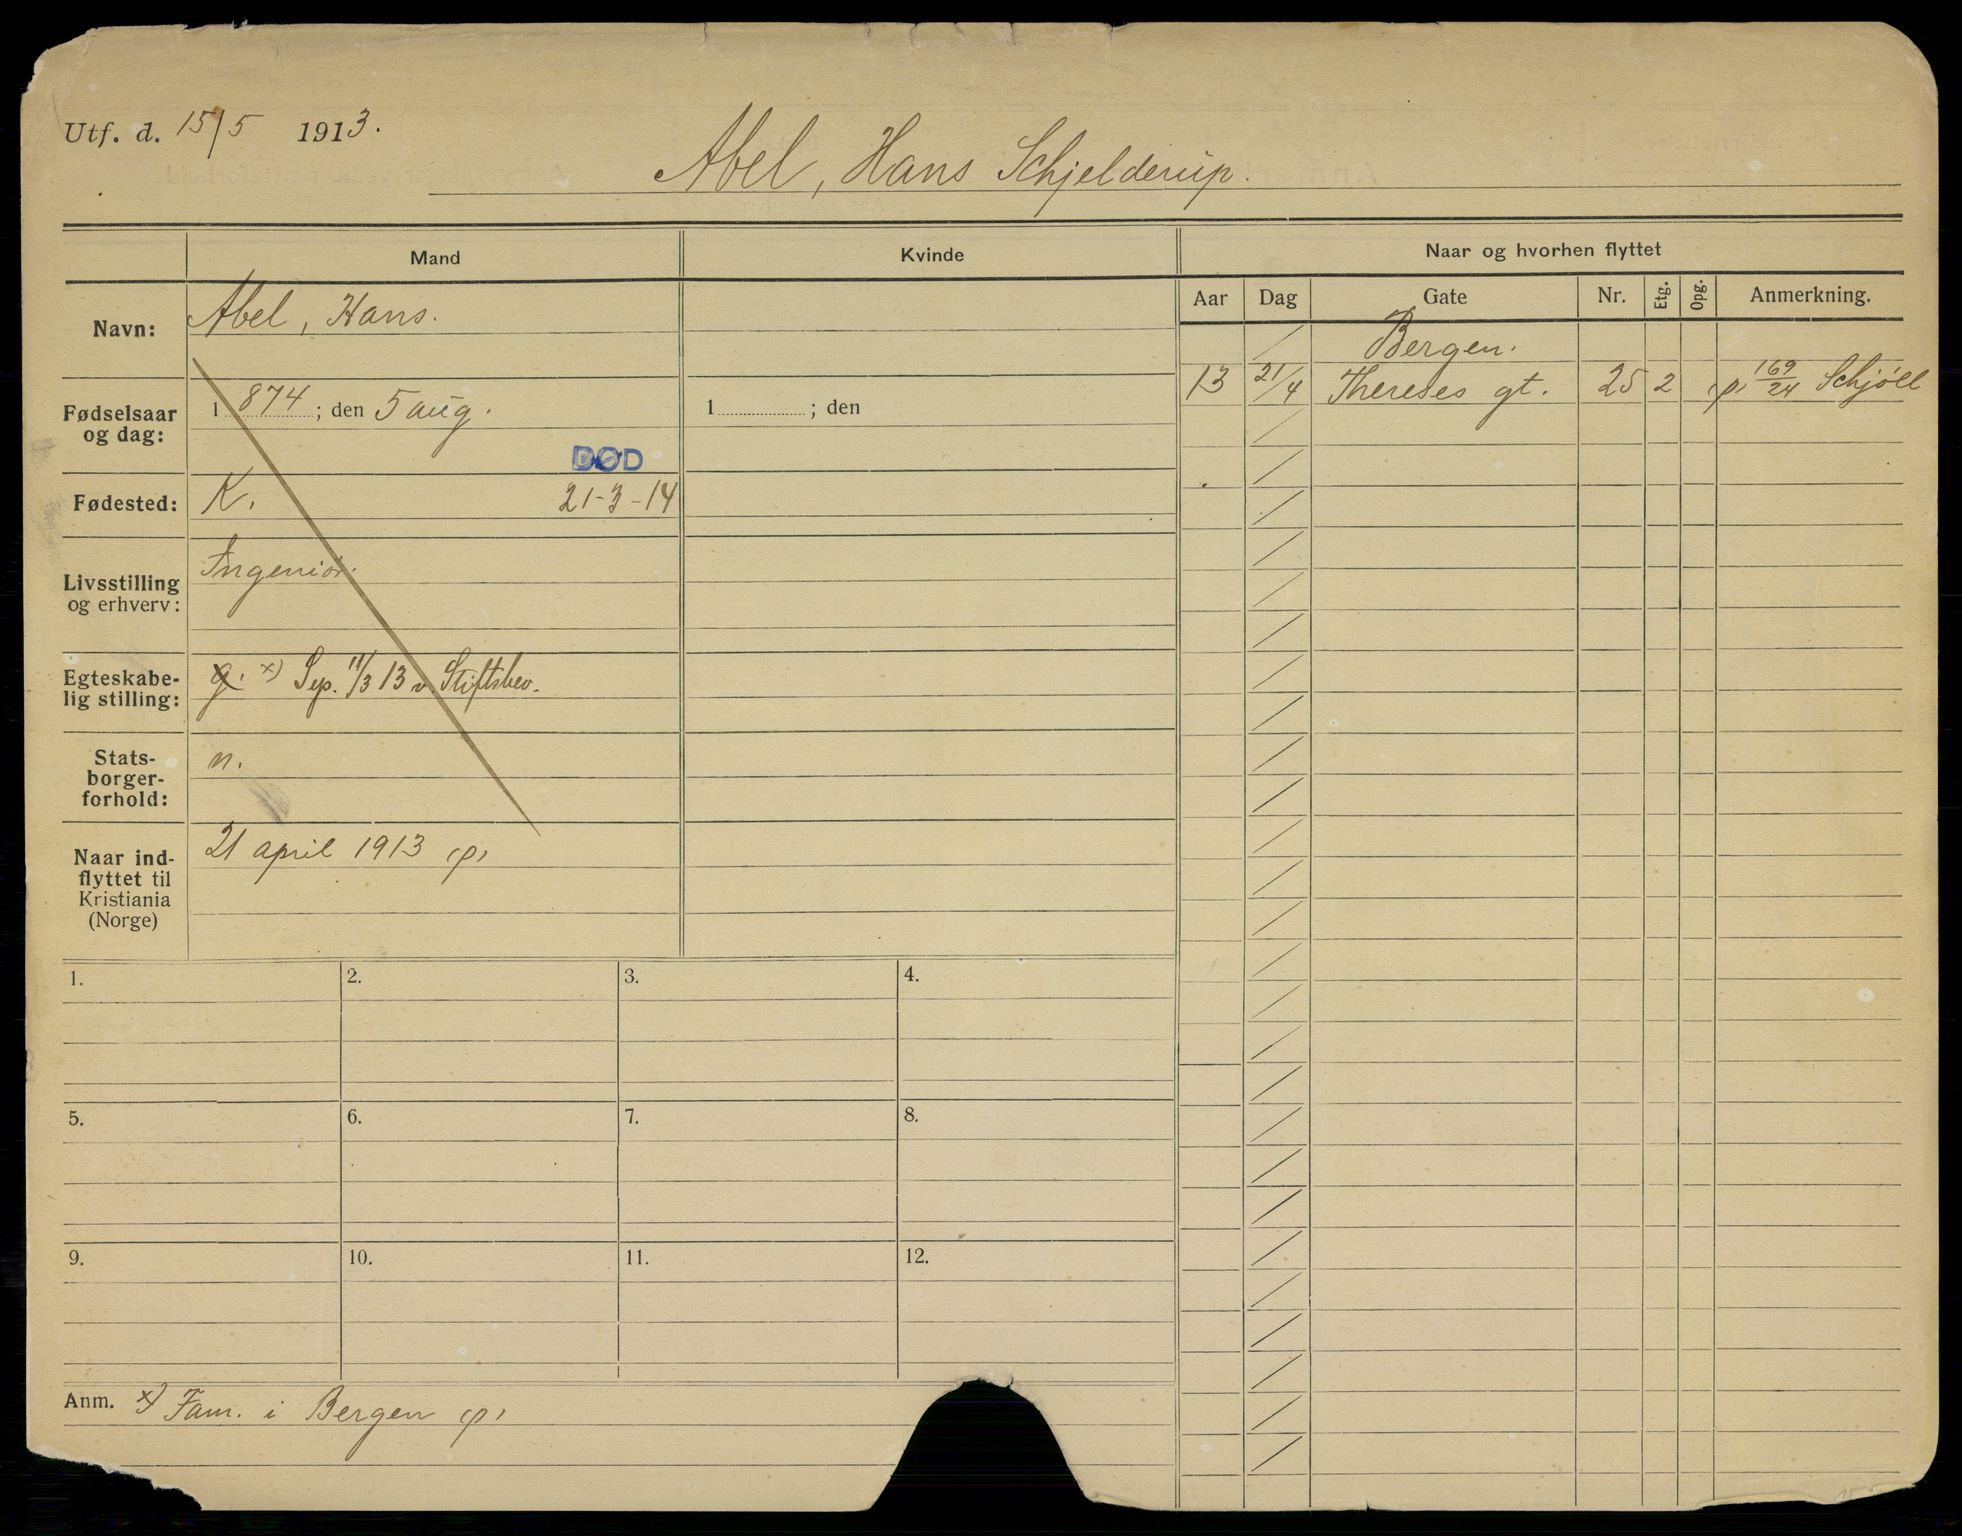 SAO, Oslo folkeregister, Registerkort, G/Gb/L0017: Menn, 1914